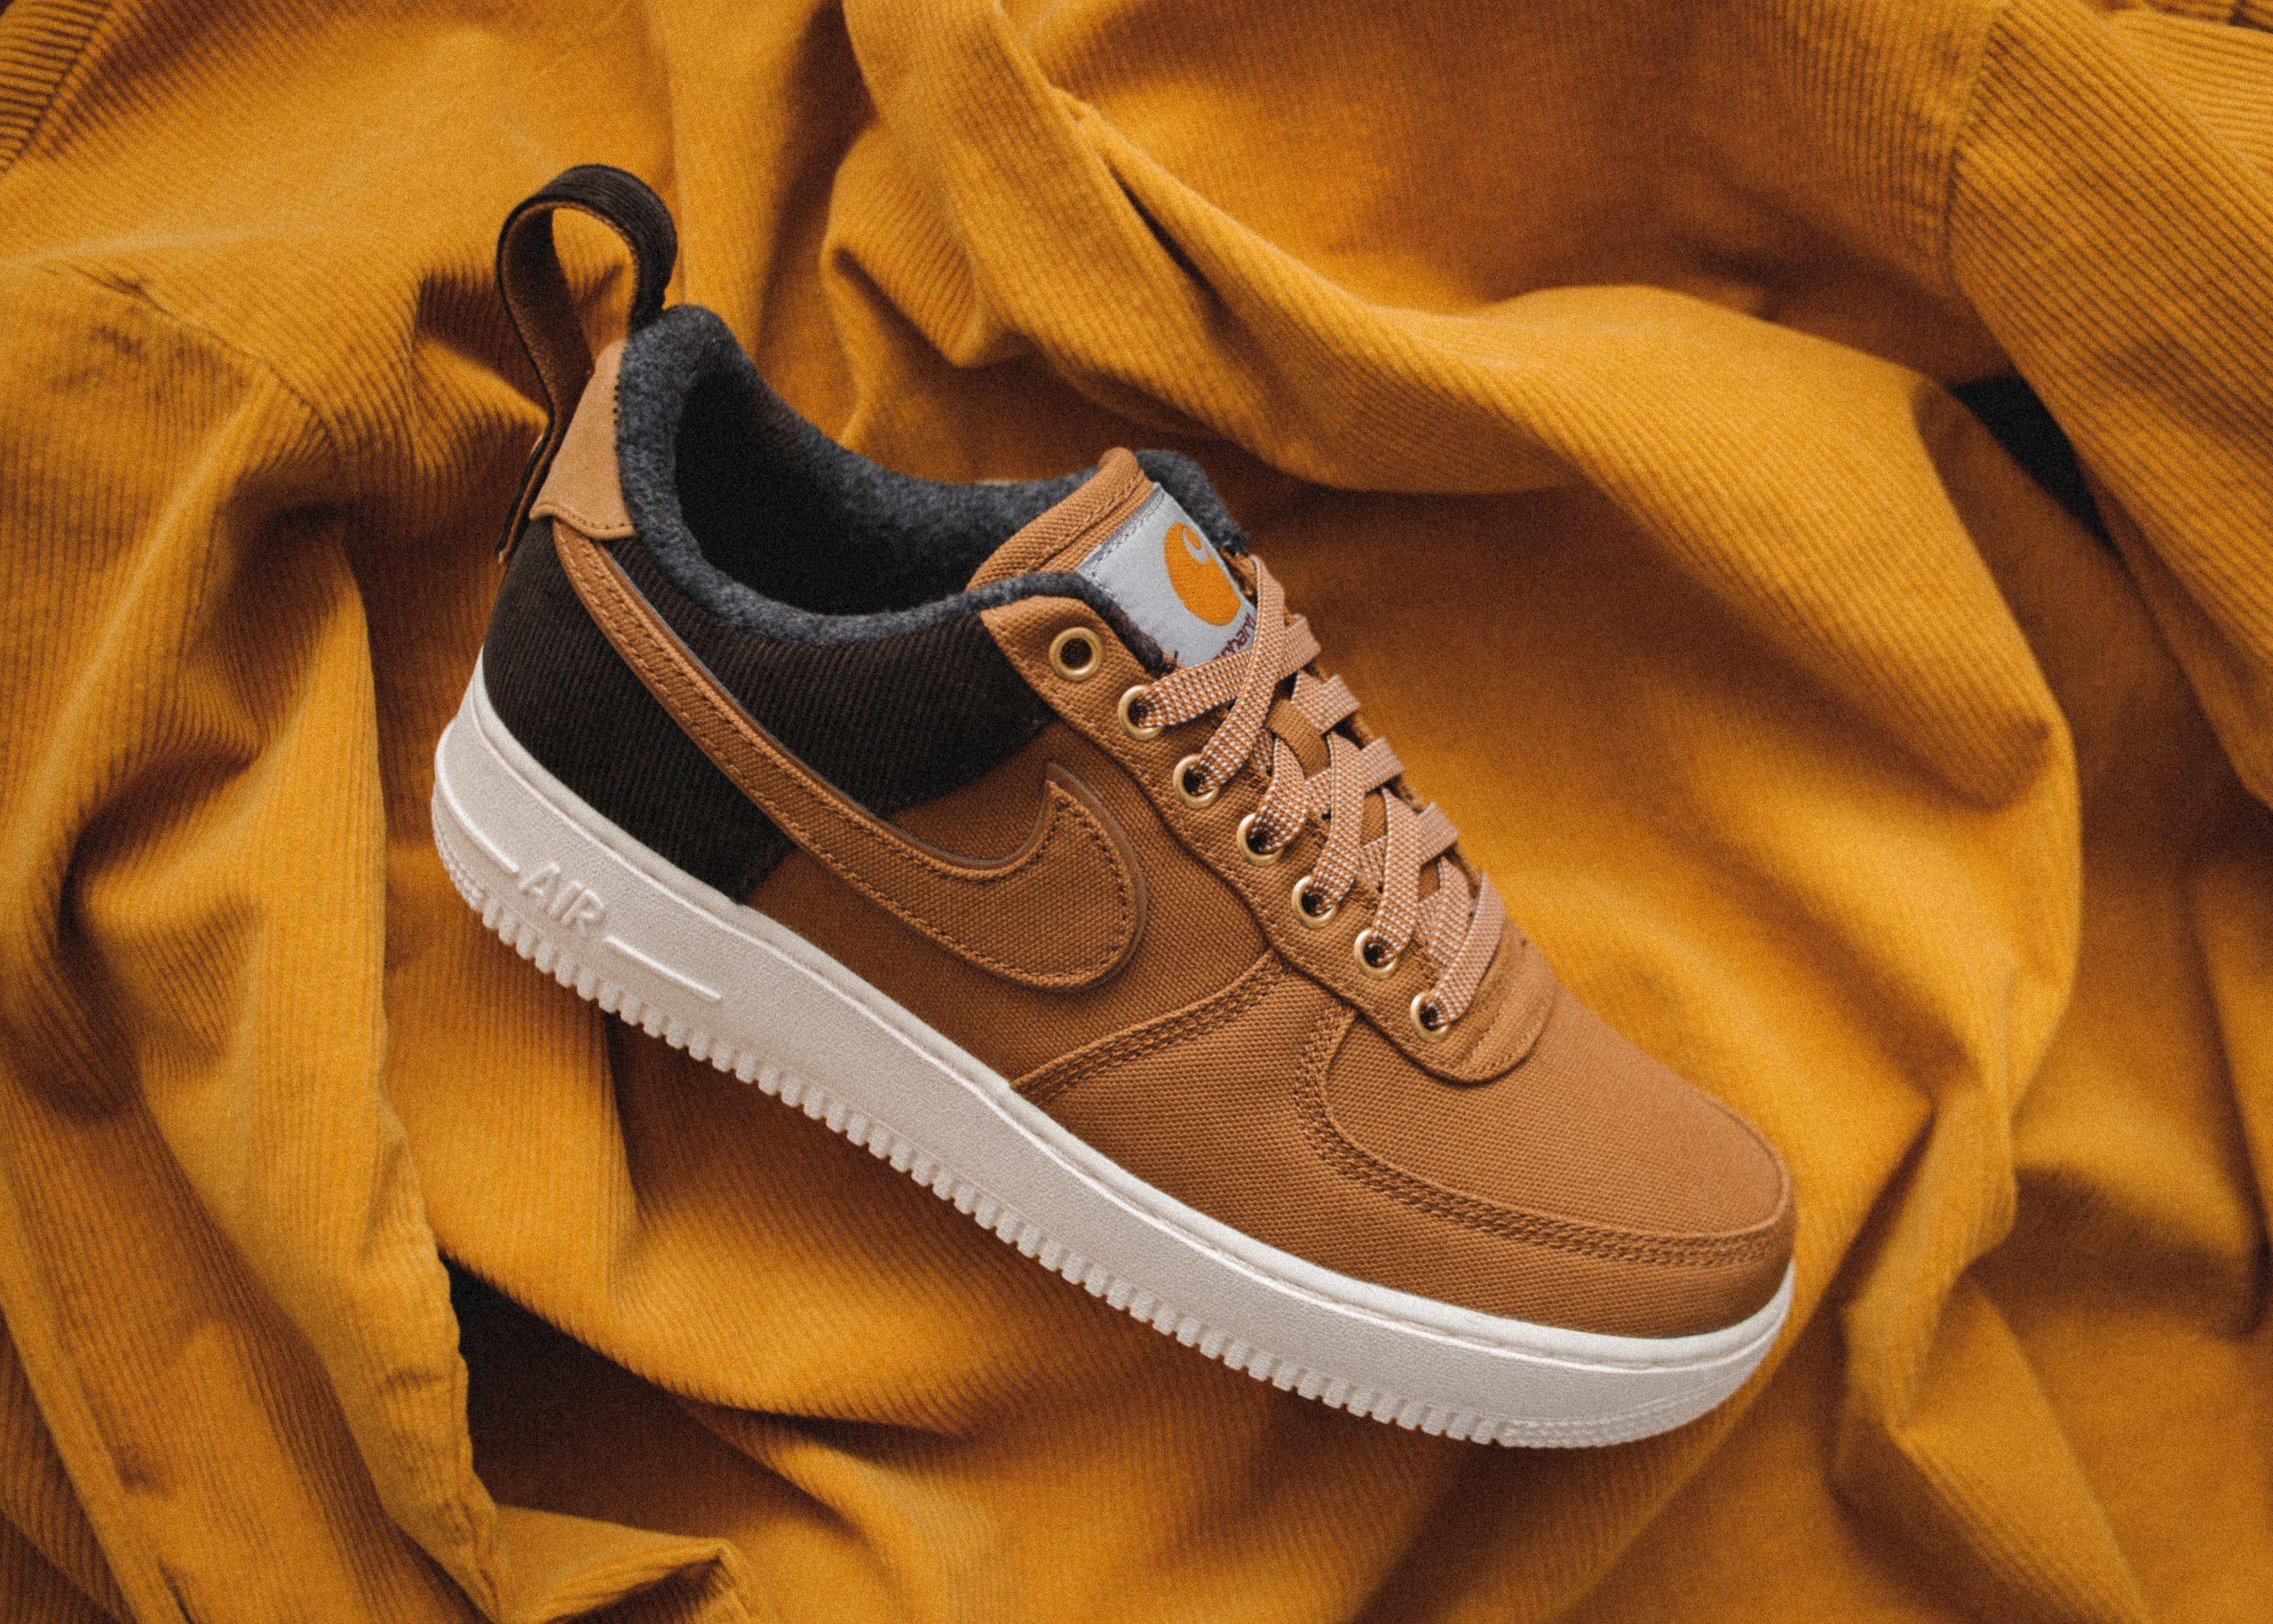 oxford sneakers low top